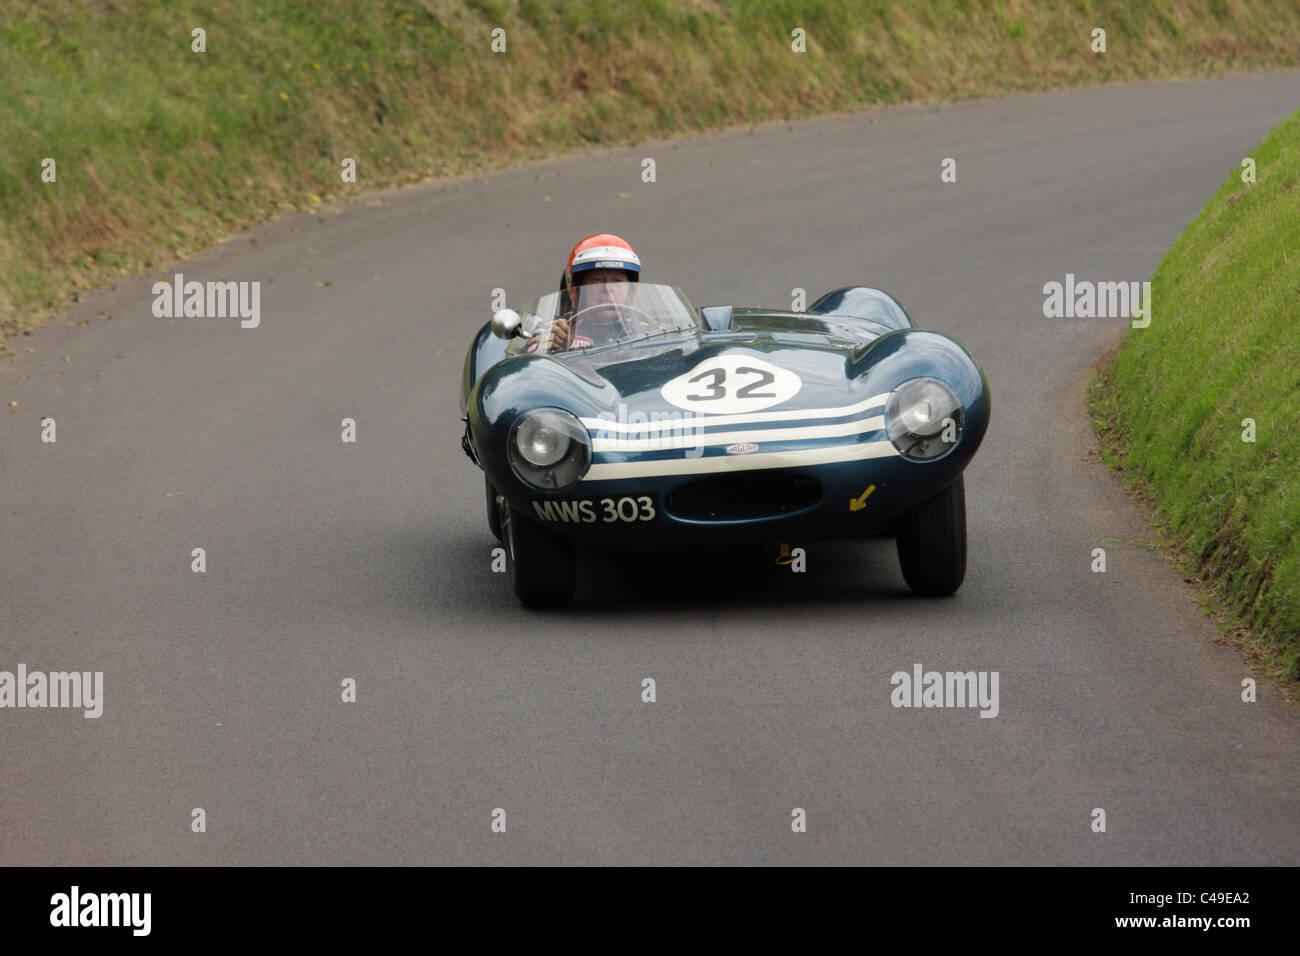 Jaguar D-Type Shelsley Walsh Hill climb, Worcestershire, England, Vereinigtes Königreich, während die Stockbild